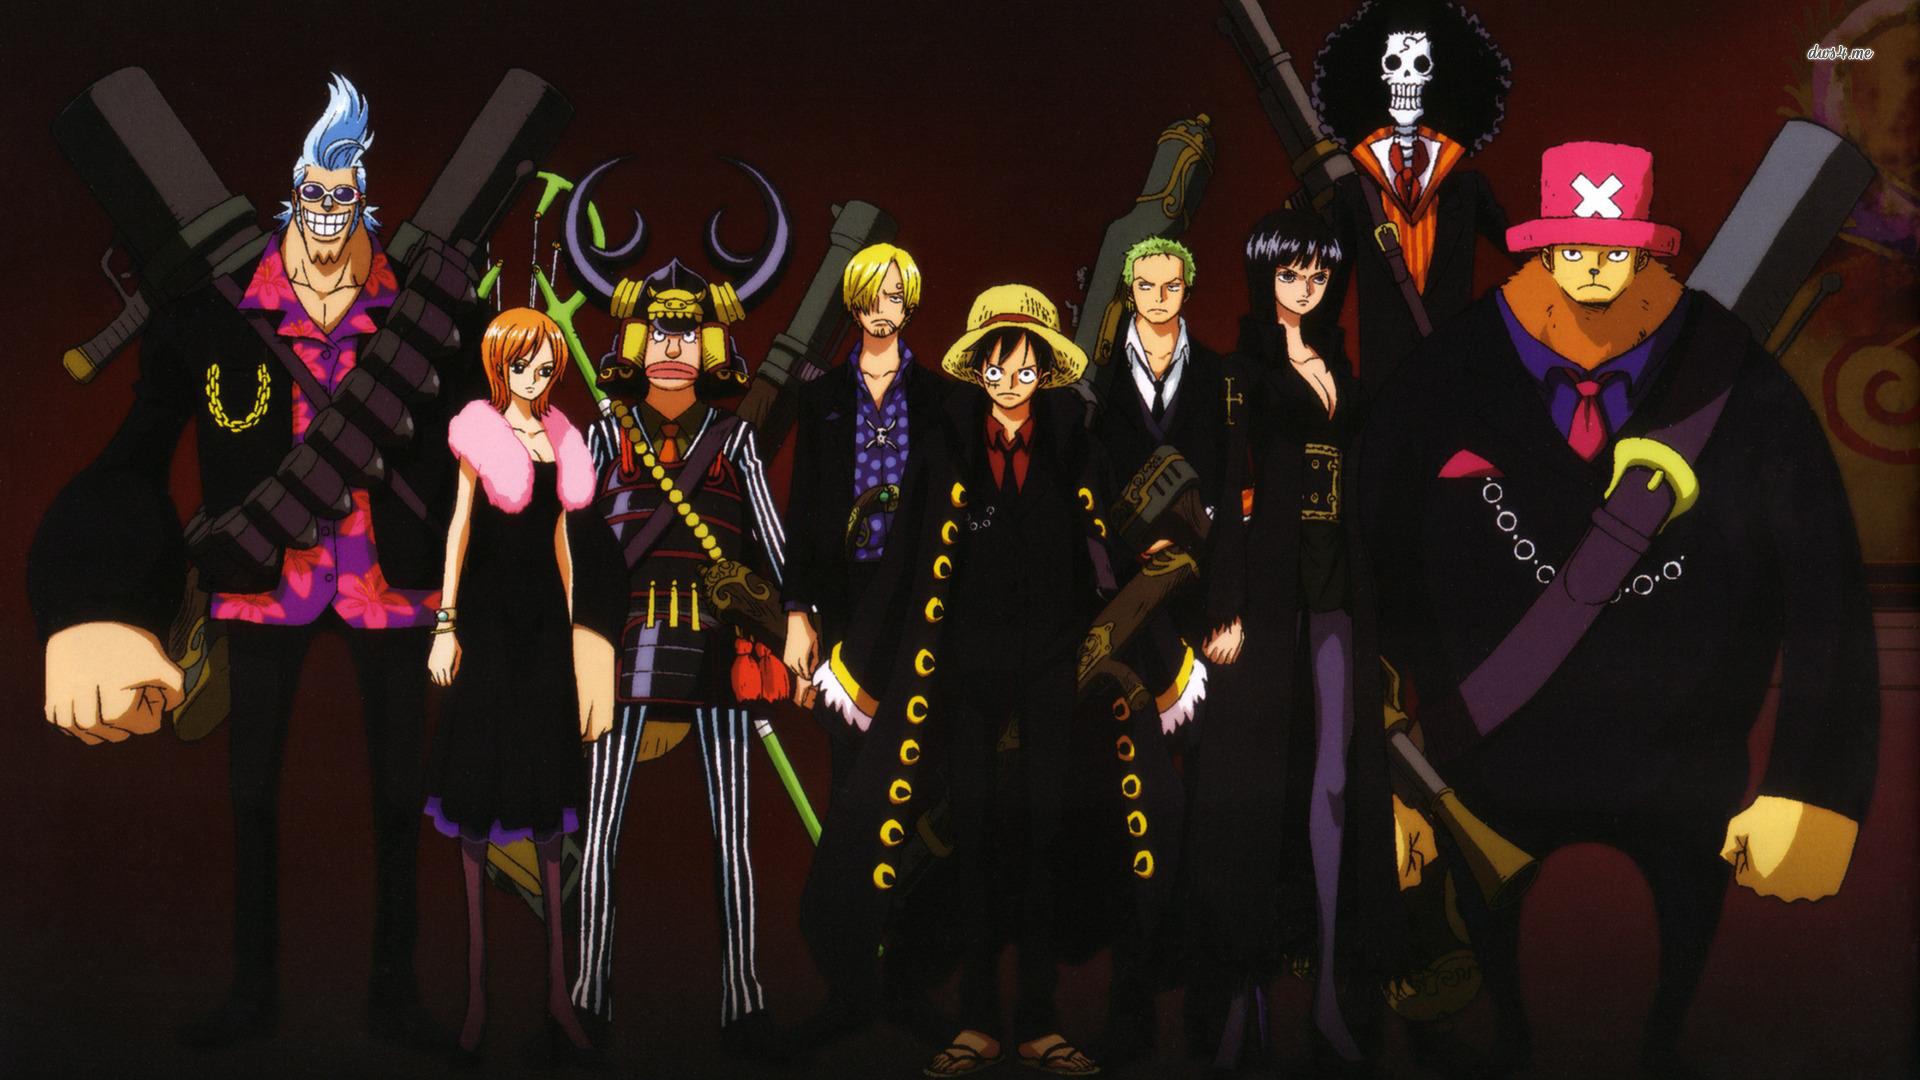 One Piece Anime Wallpaper - WallpaperSafari